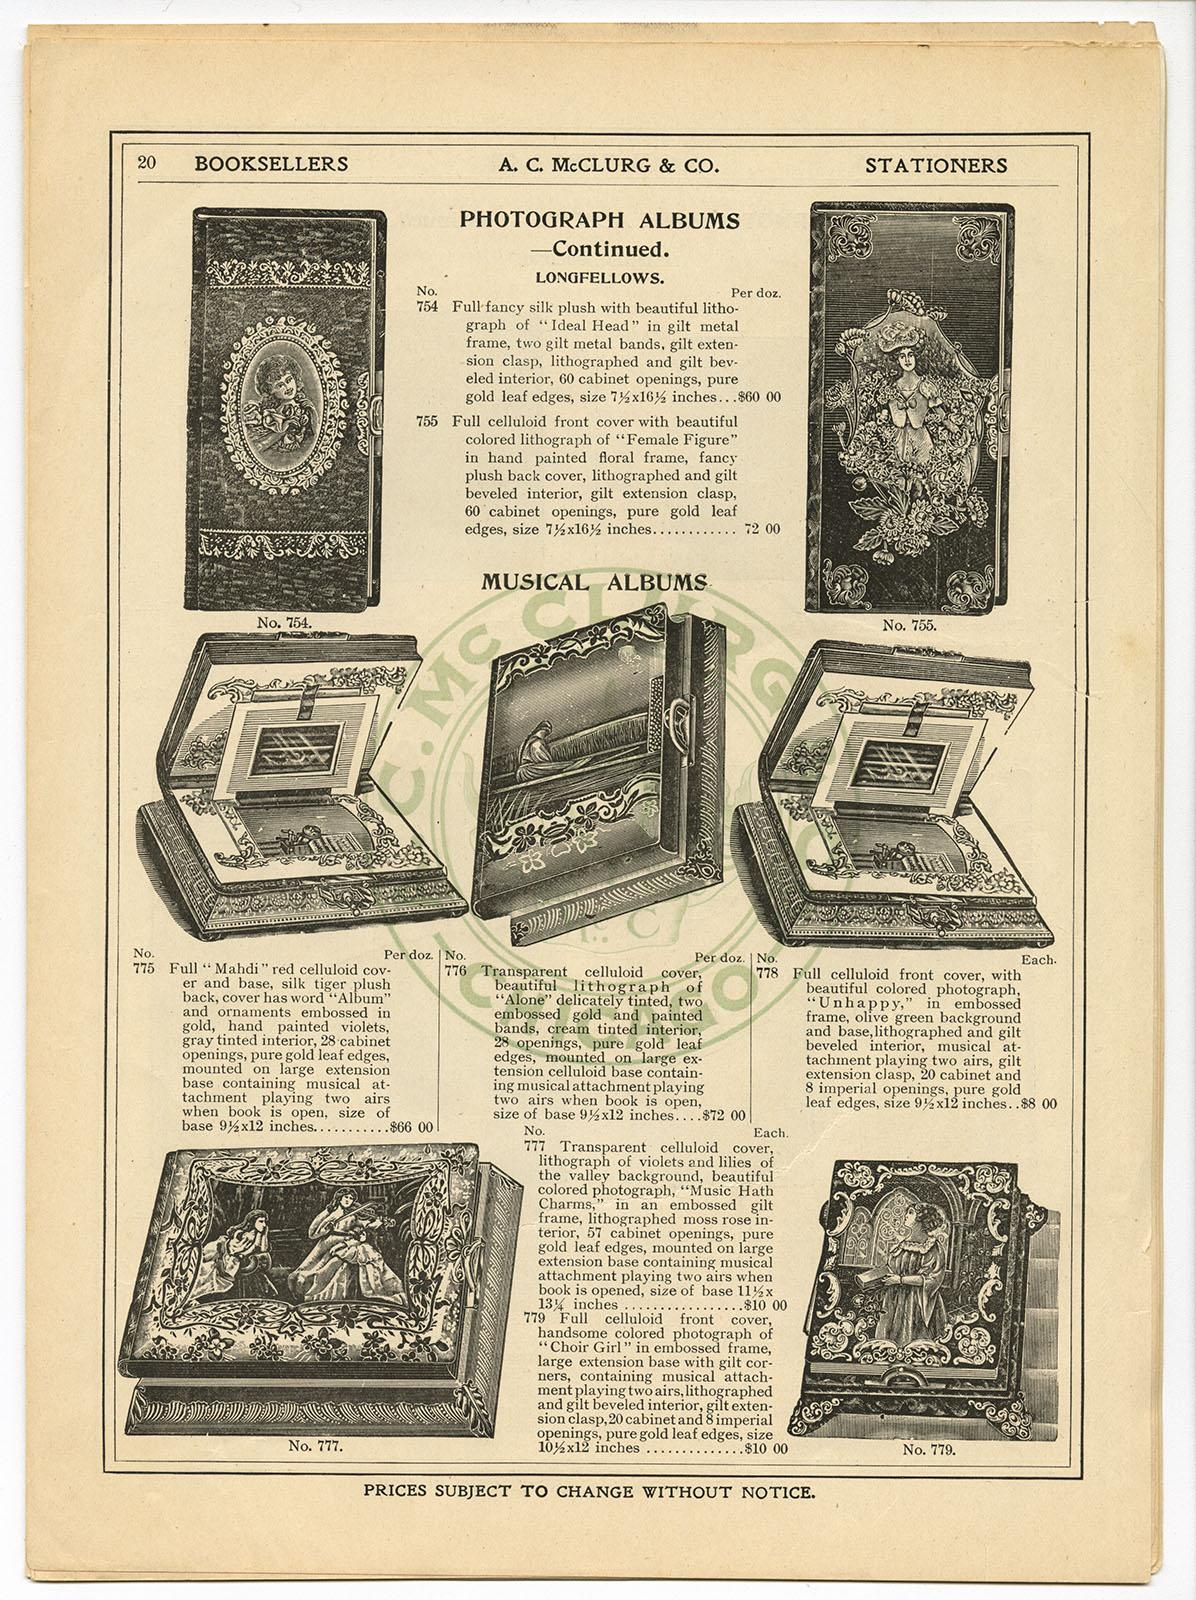 A.C. McClurg & Co. Photograph Albums (Chicago, ca. 1901). Michael Zinman Binding Fund.